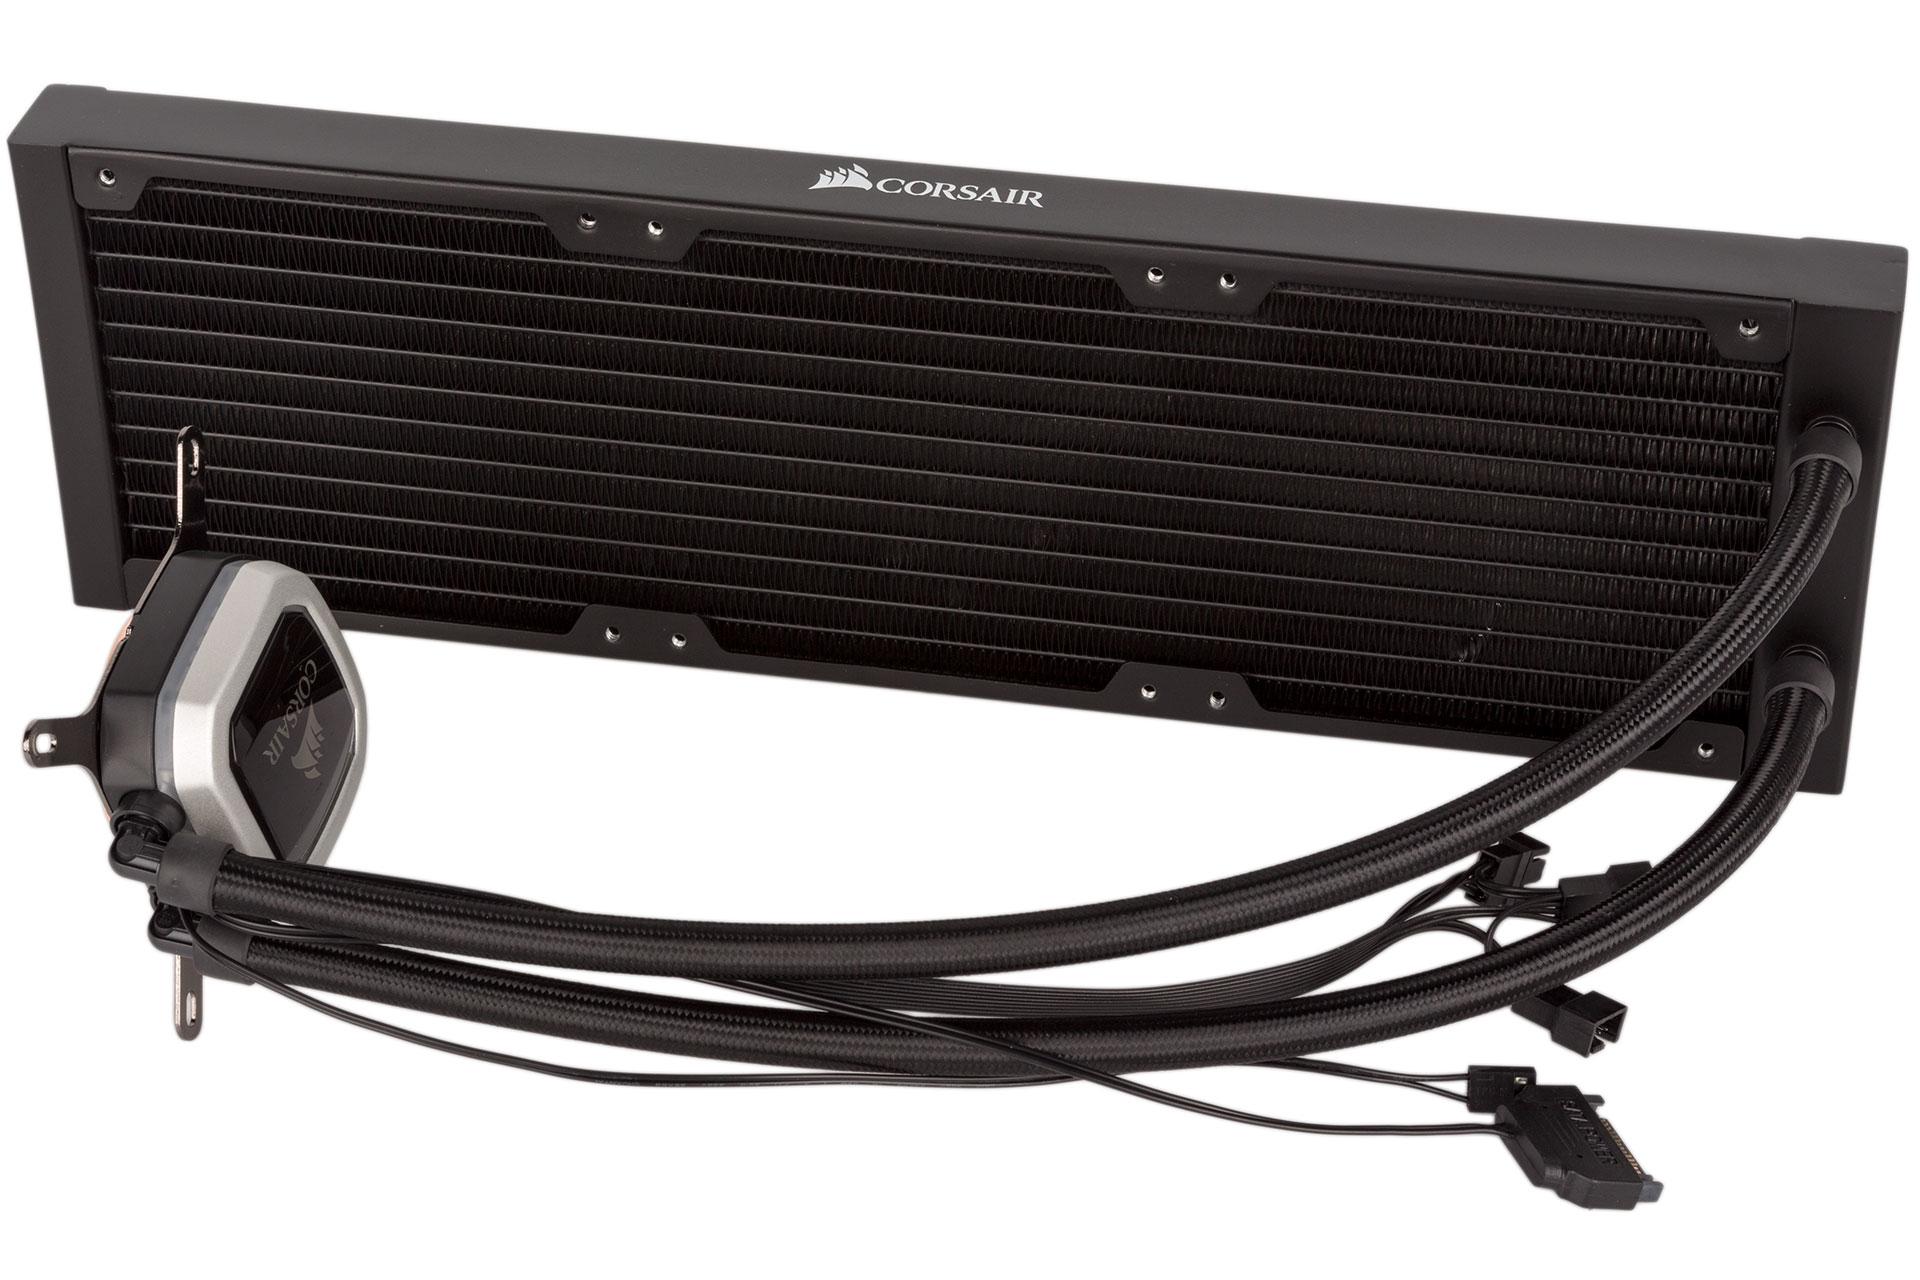 Corsair Hydro Series H150i Pro RGB and H115i Pro RGB Reviews | bit